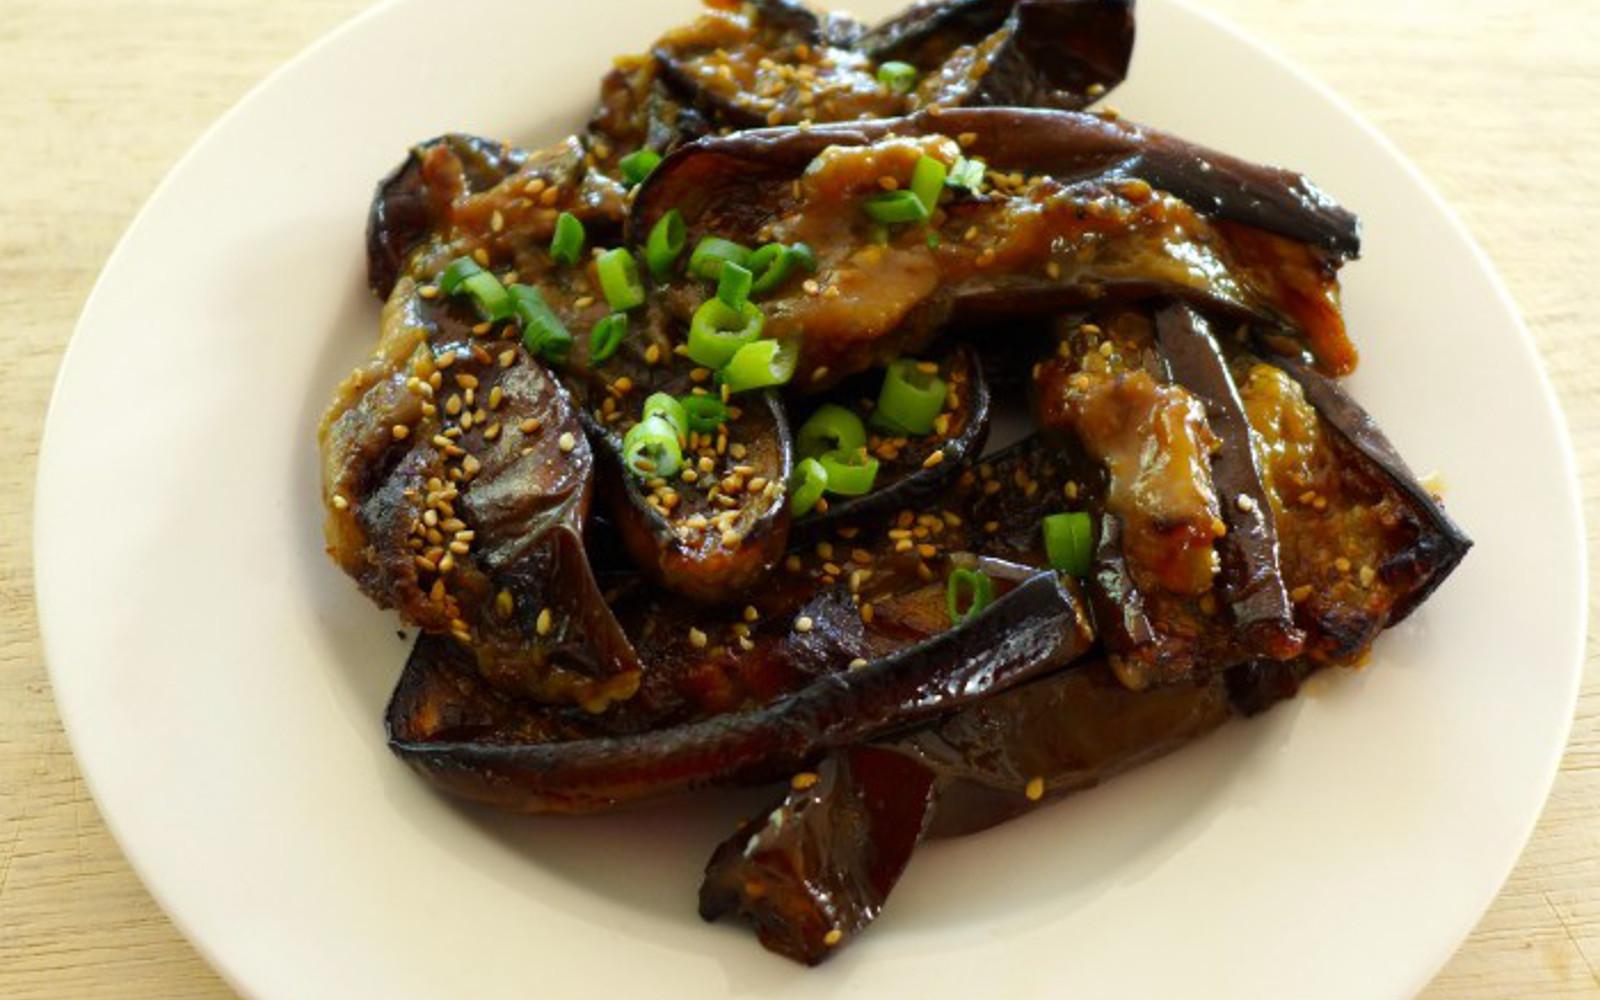 Miso-Roasted Japanese Eggplant and Zucchini